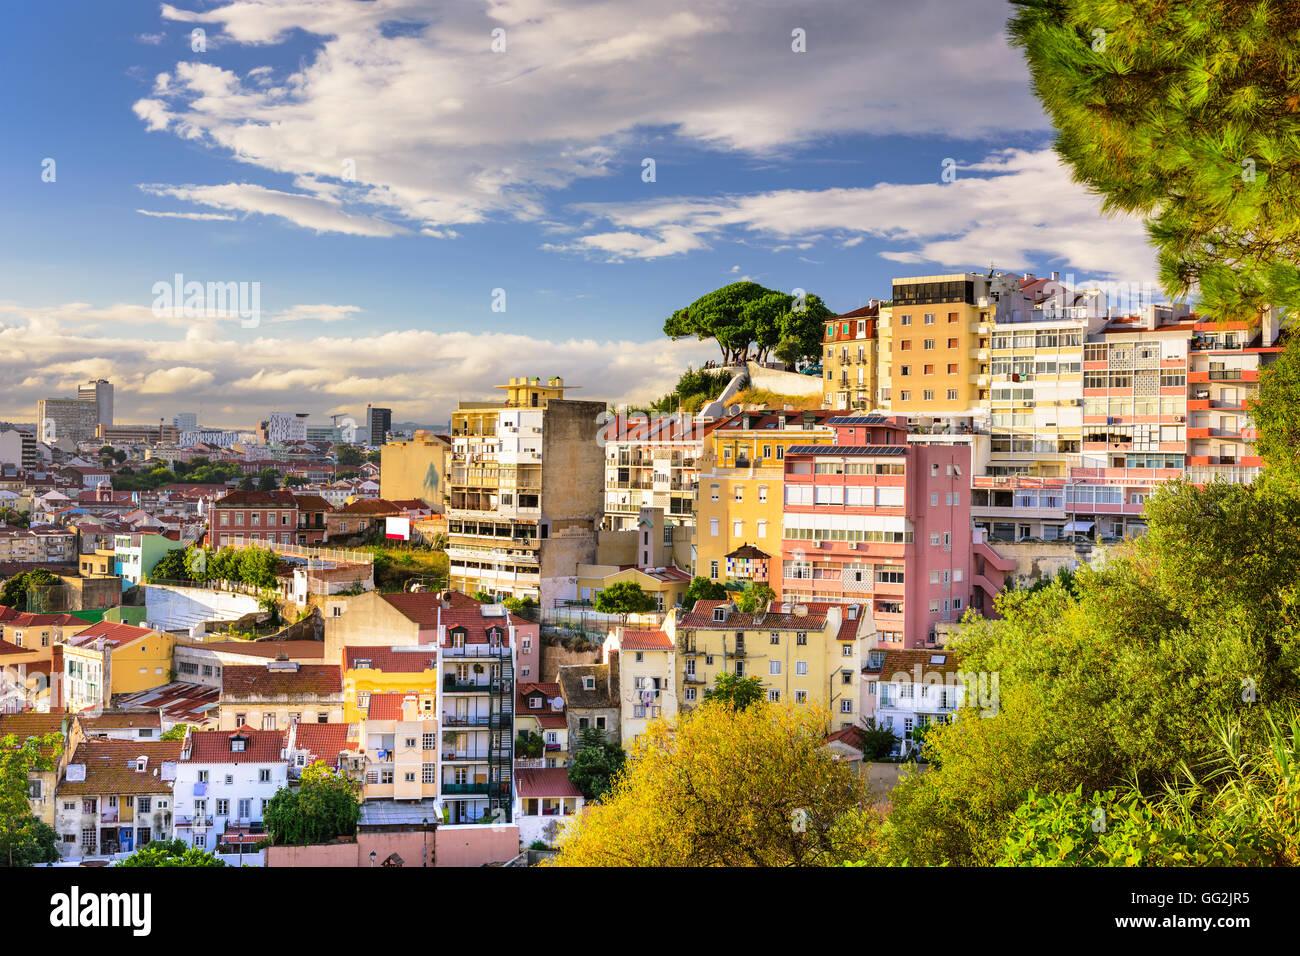 Lisbon, Portugal hillside cityscape. - Stock Image